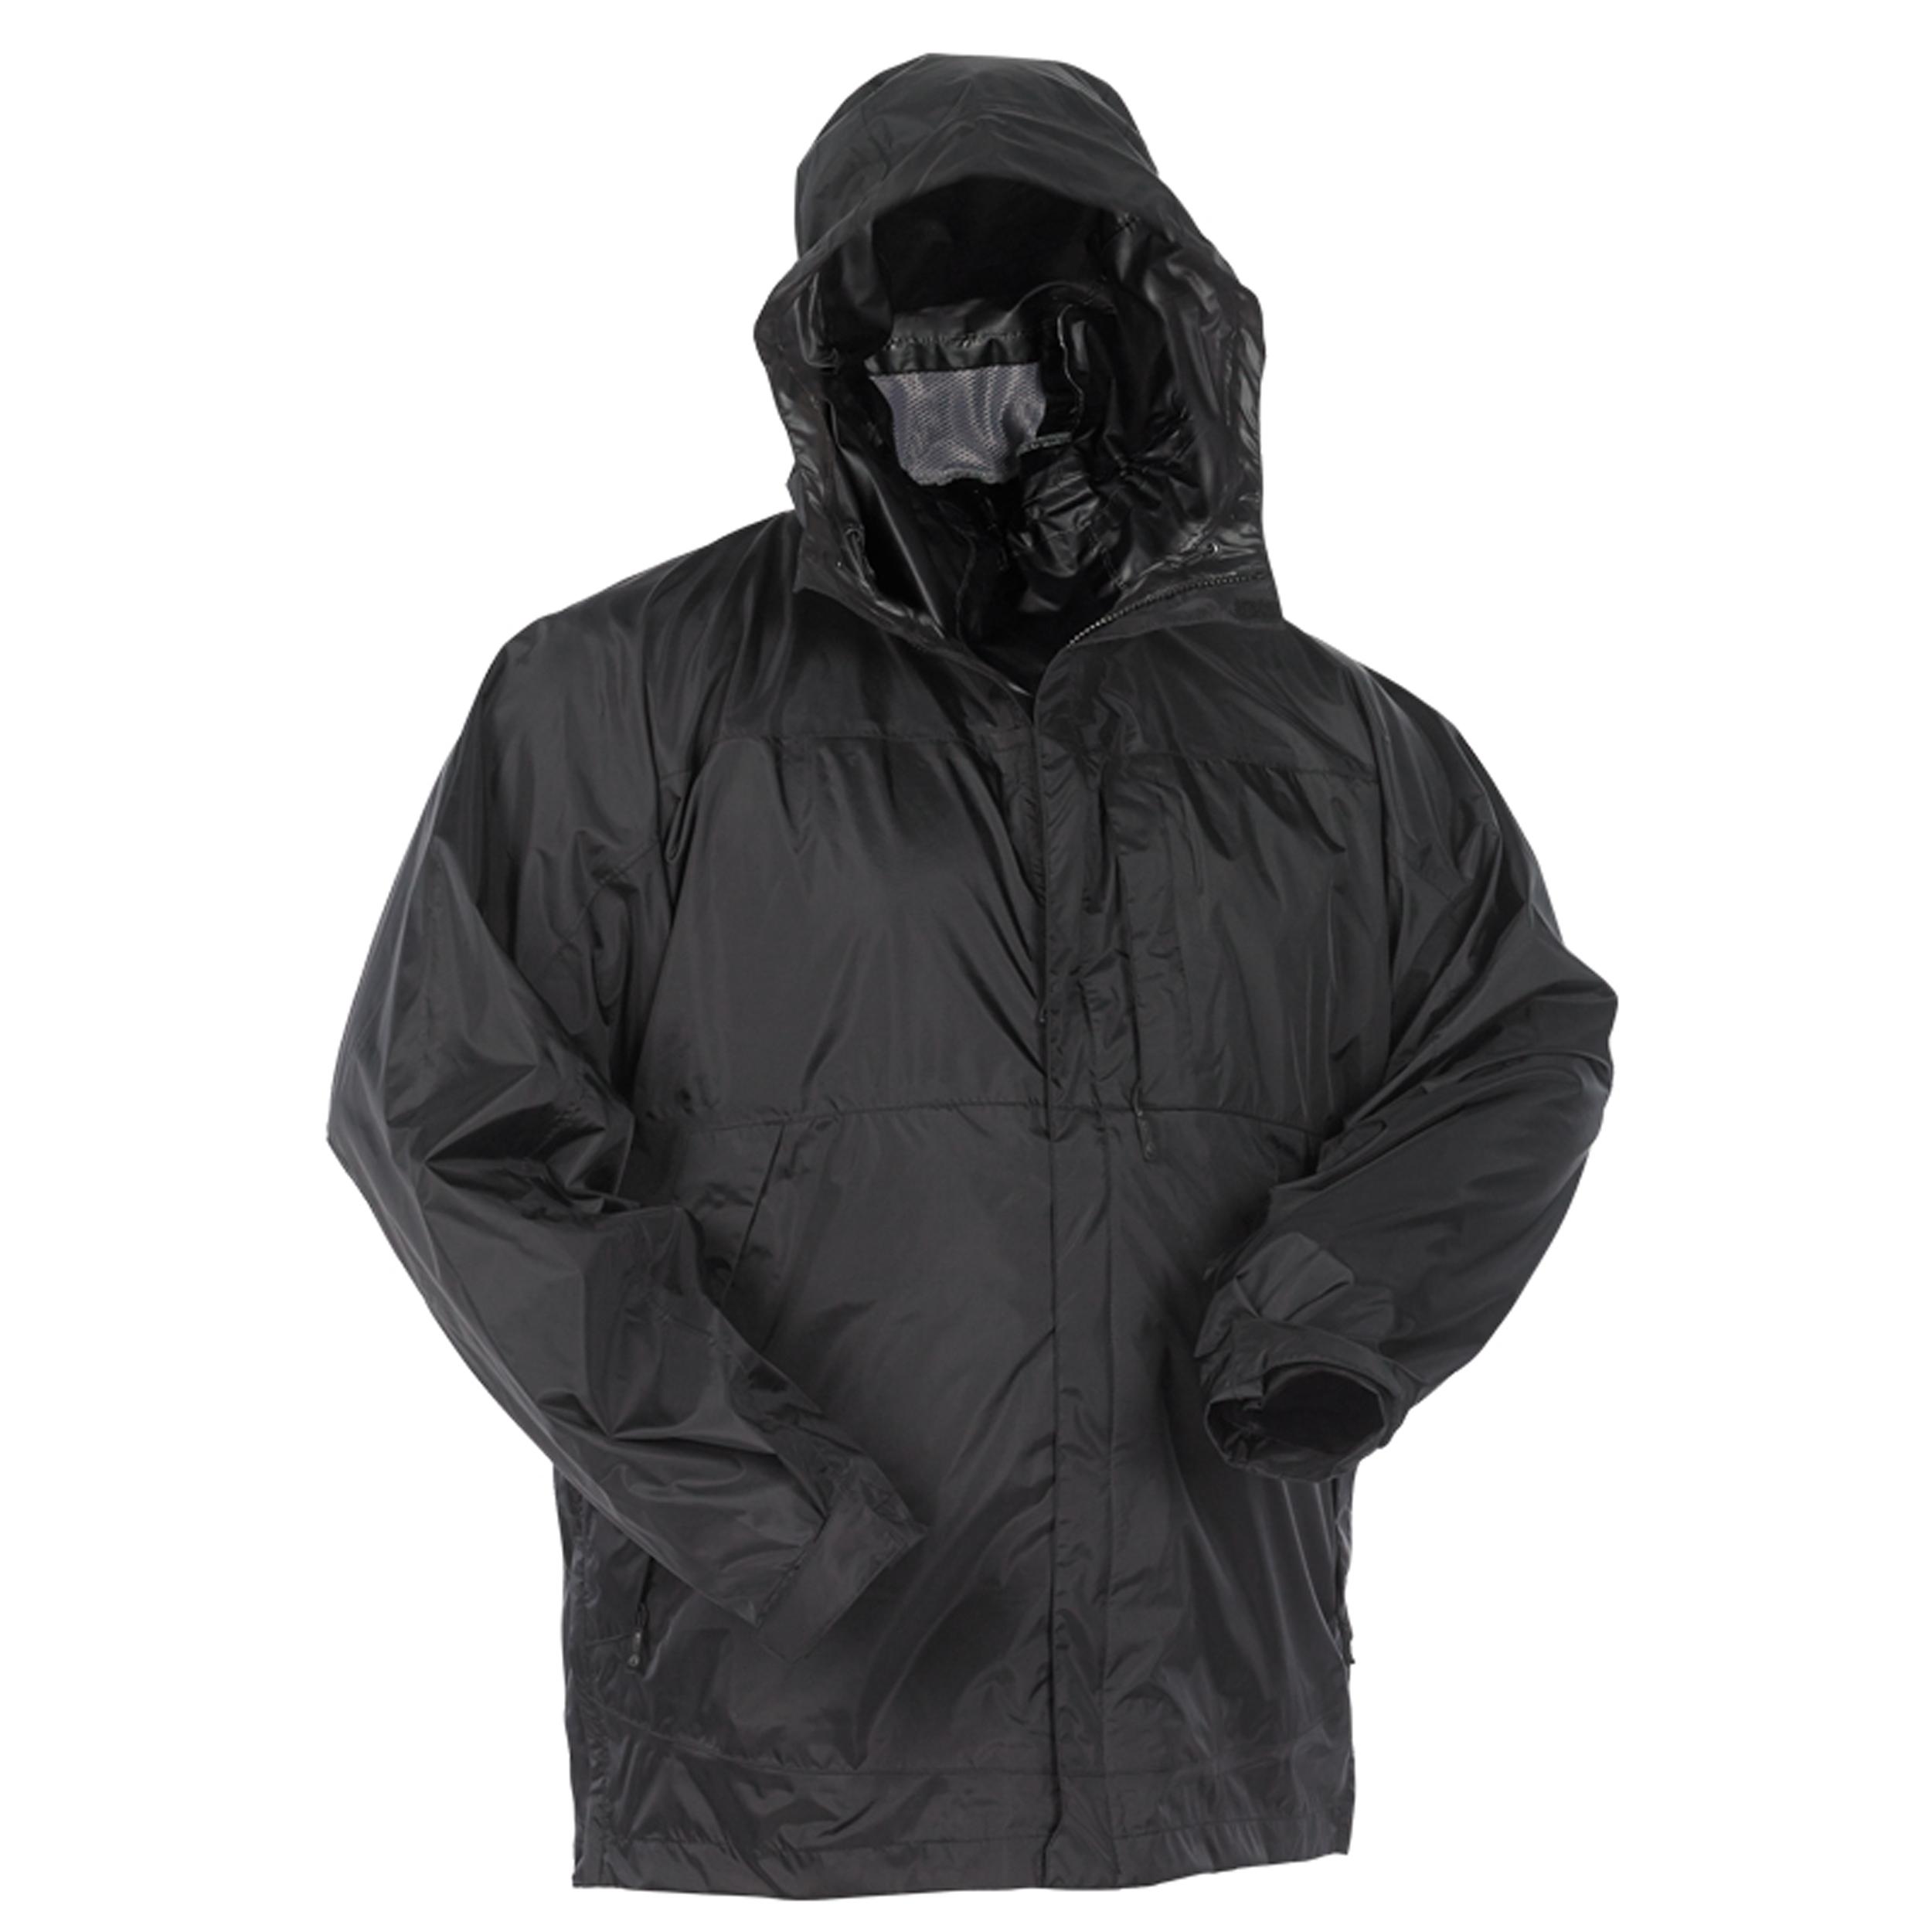 Snugpak Rj1 Rain Jacket Black Xxl